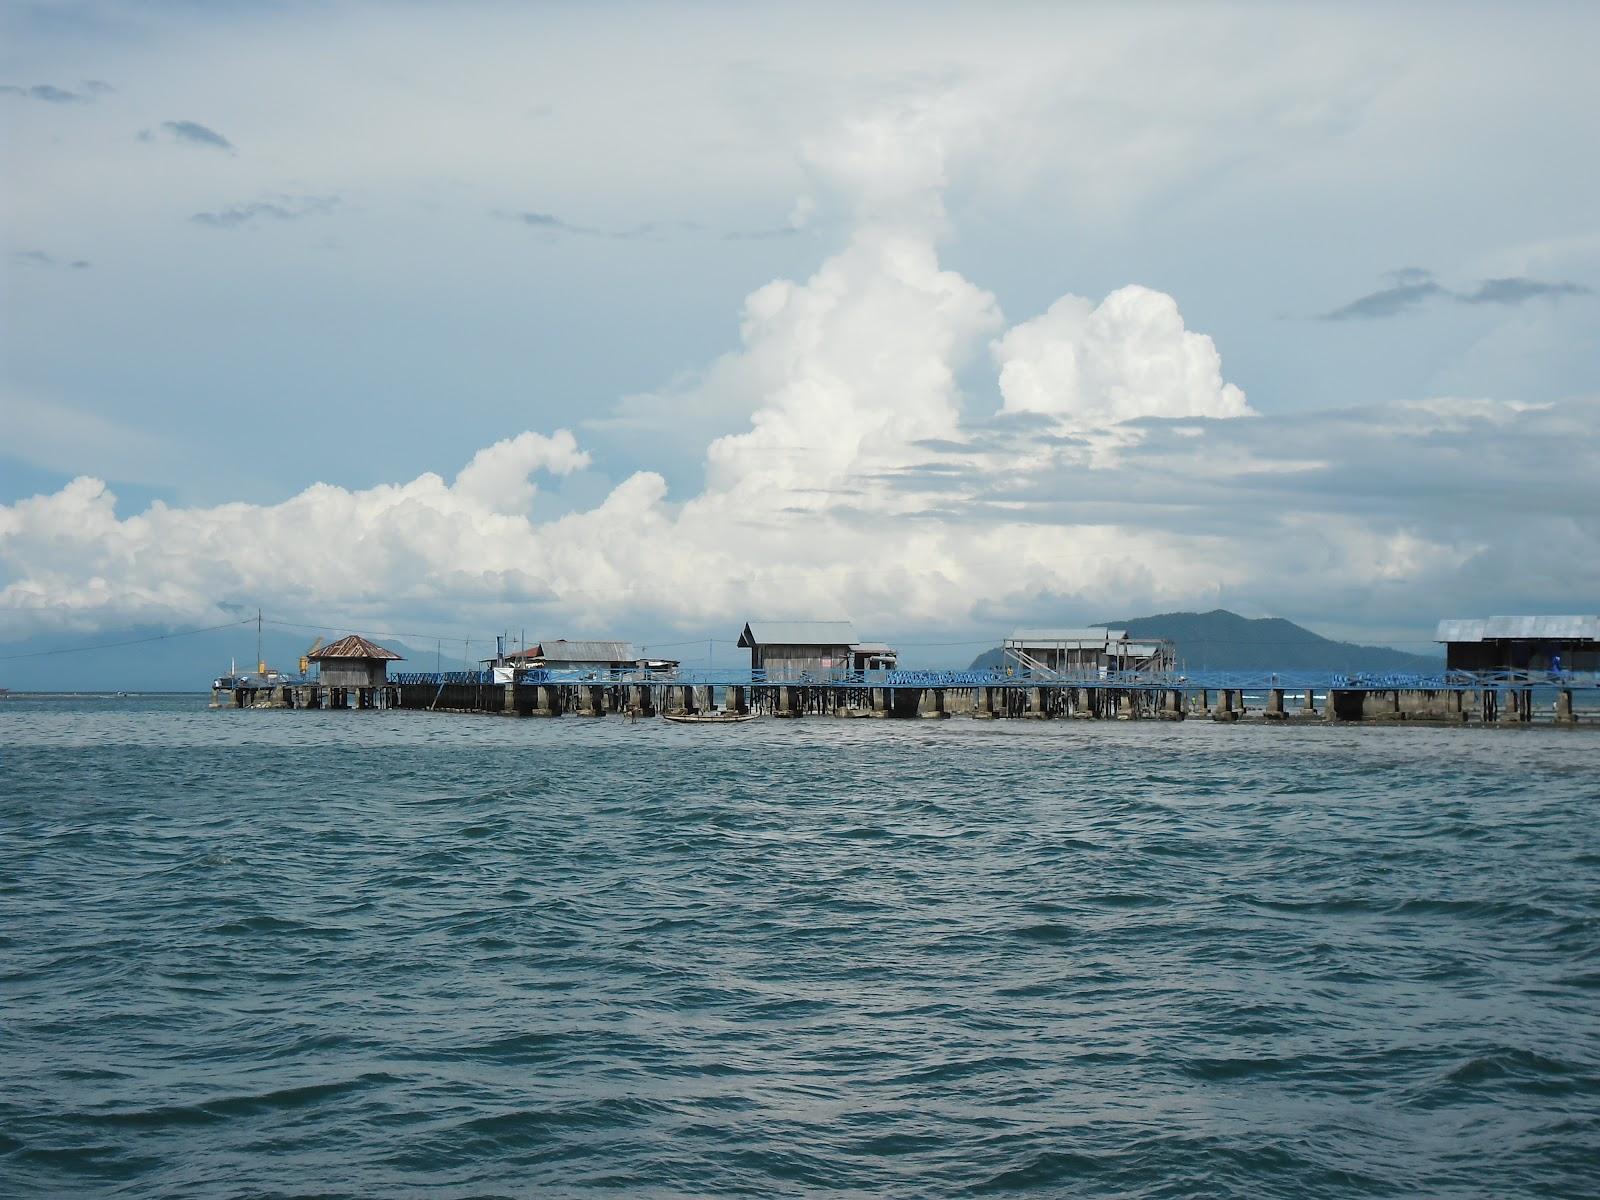 Jayapura Indonesia  City pictures : SOUTHERN CROSS SOJOURN: Cruising Jayapura, Papua, Indonesia